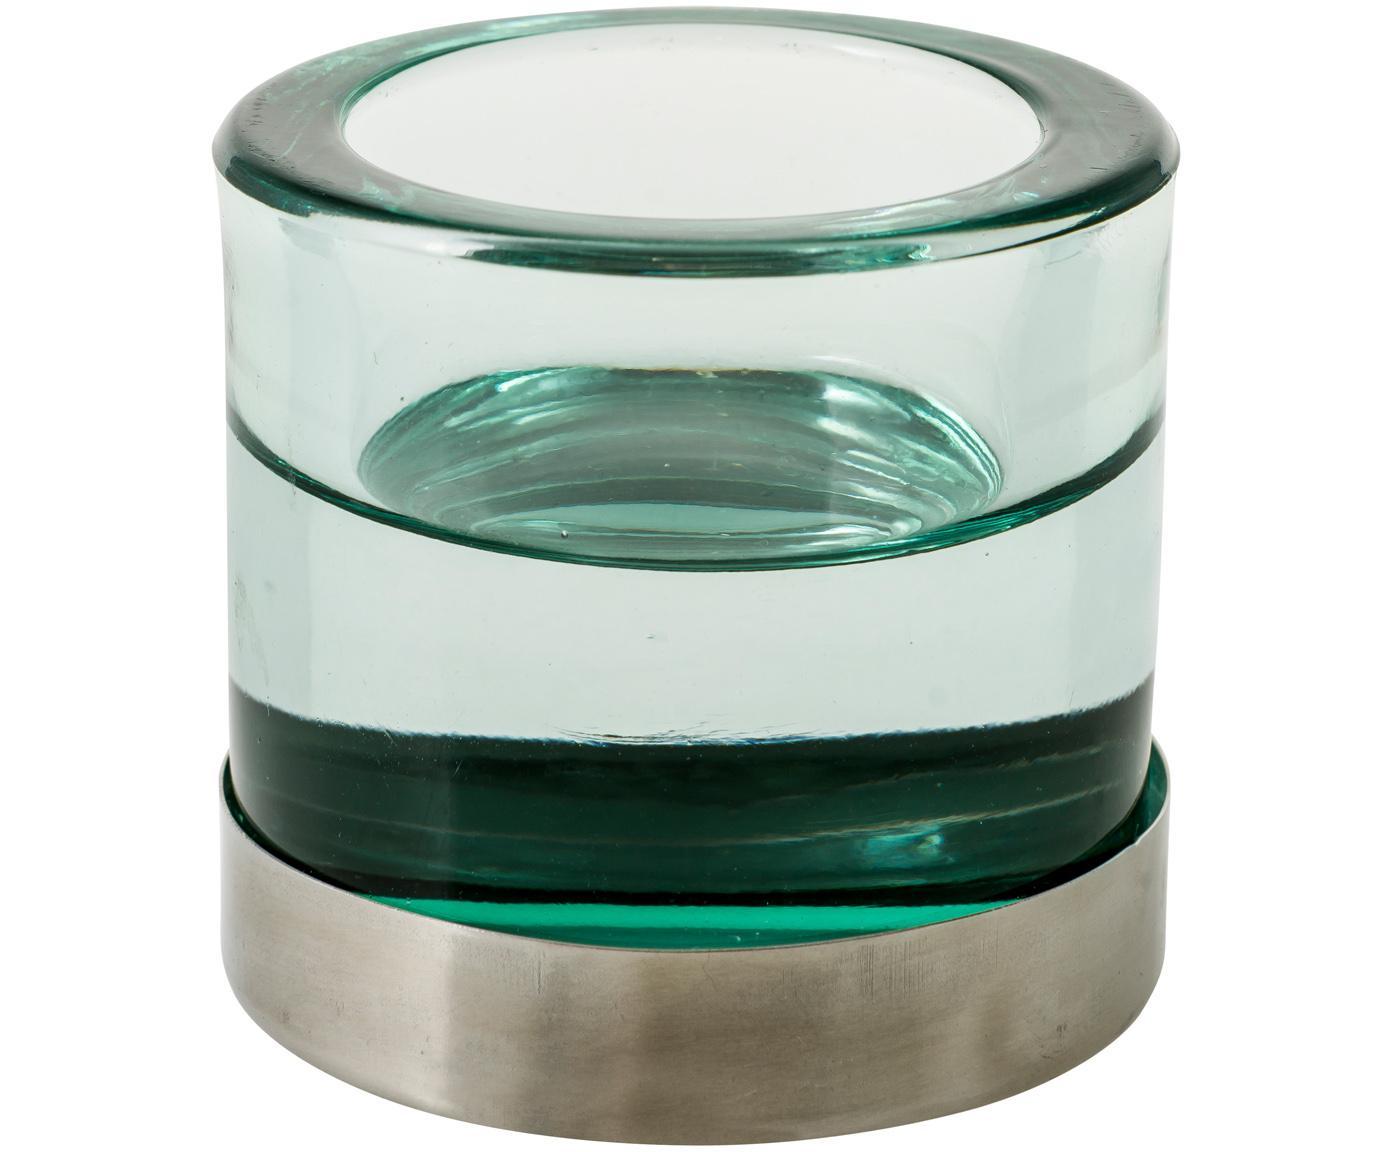 Portalumini Blanka, Vetro, metallo, Verde, argento, Ø 6 x Alt. 6 cm